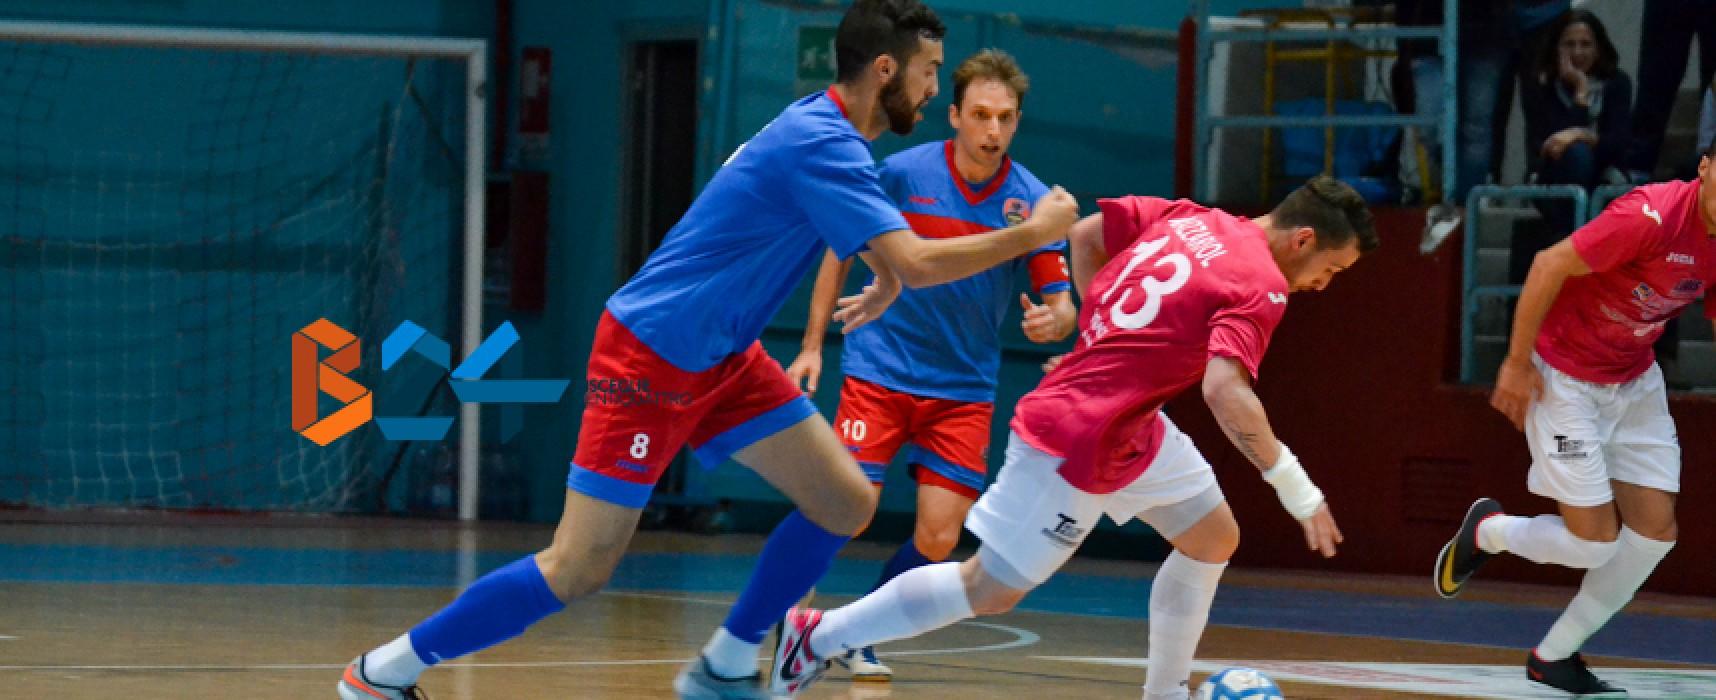 Cinquina del Futsal Bisceglie al Catania/VIDEO HIGHLIGHTS